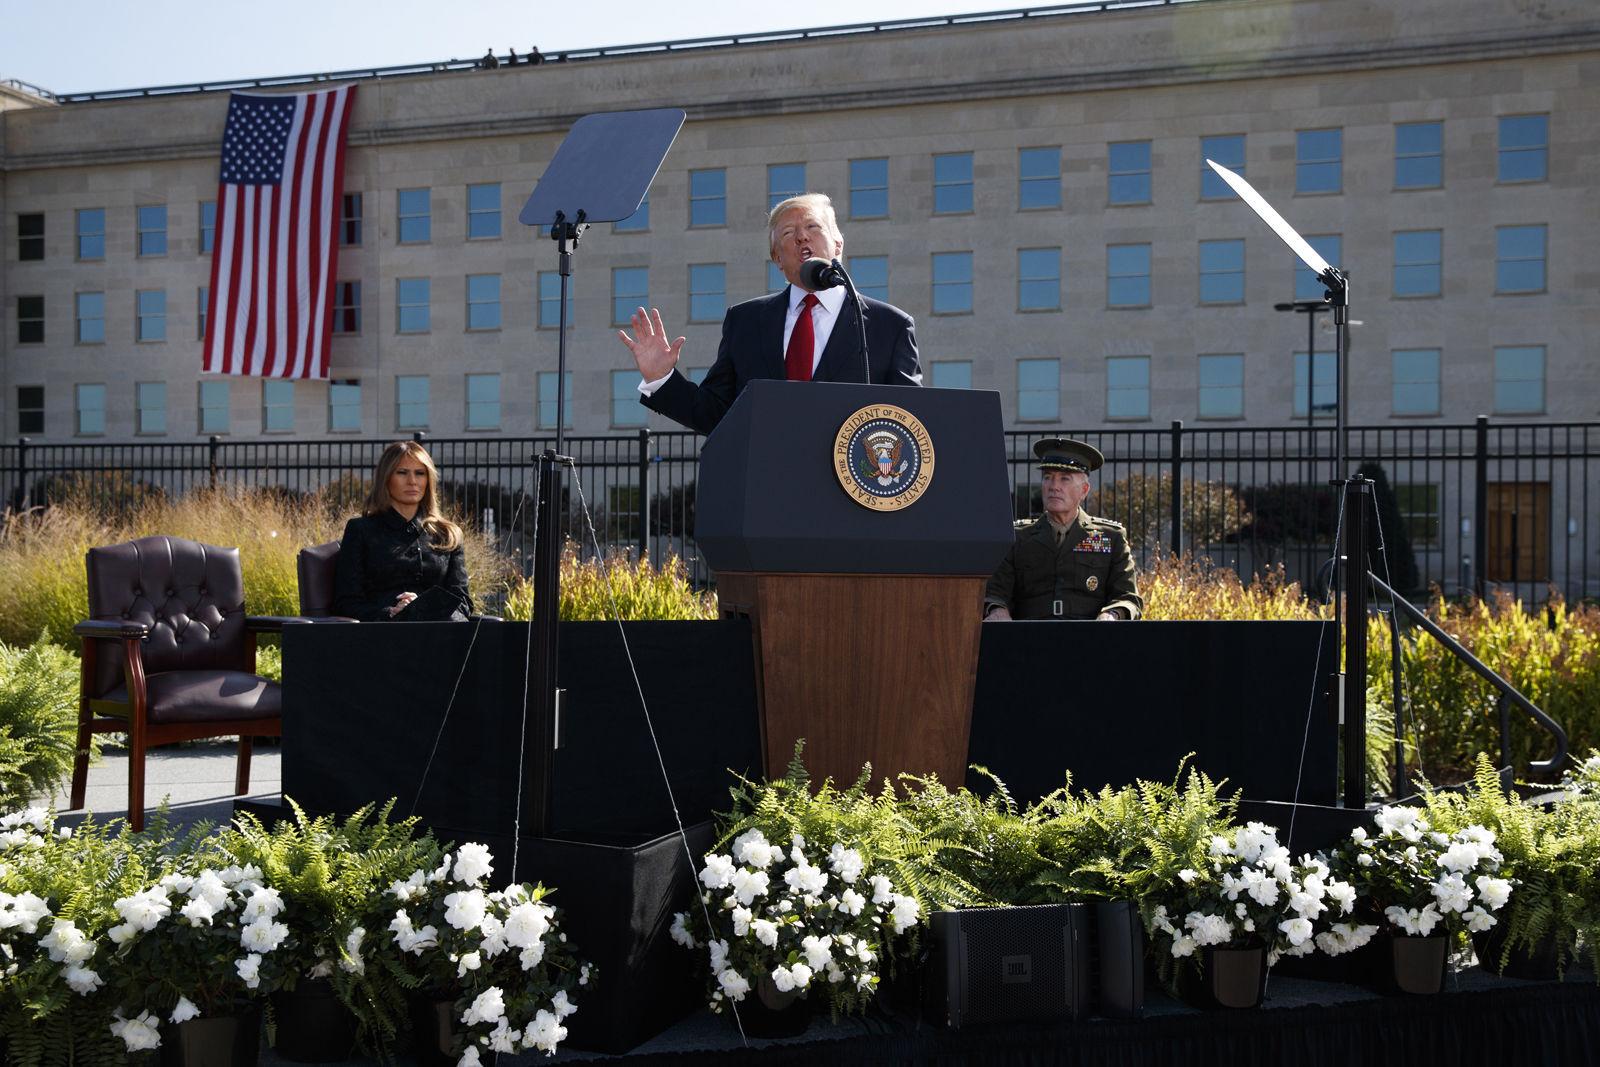 Trump marks 16th anniversary of 9/11 attacks